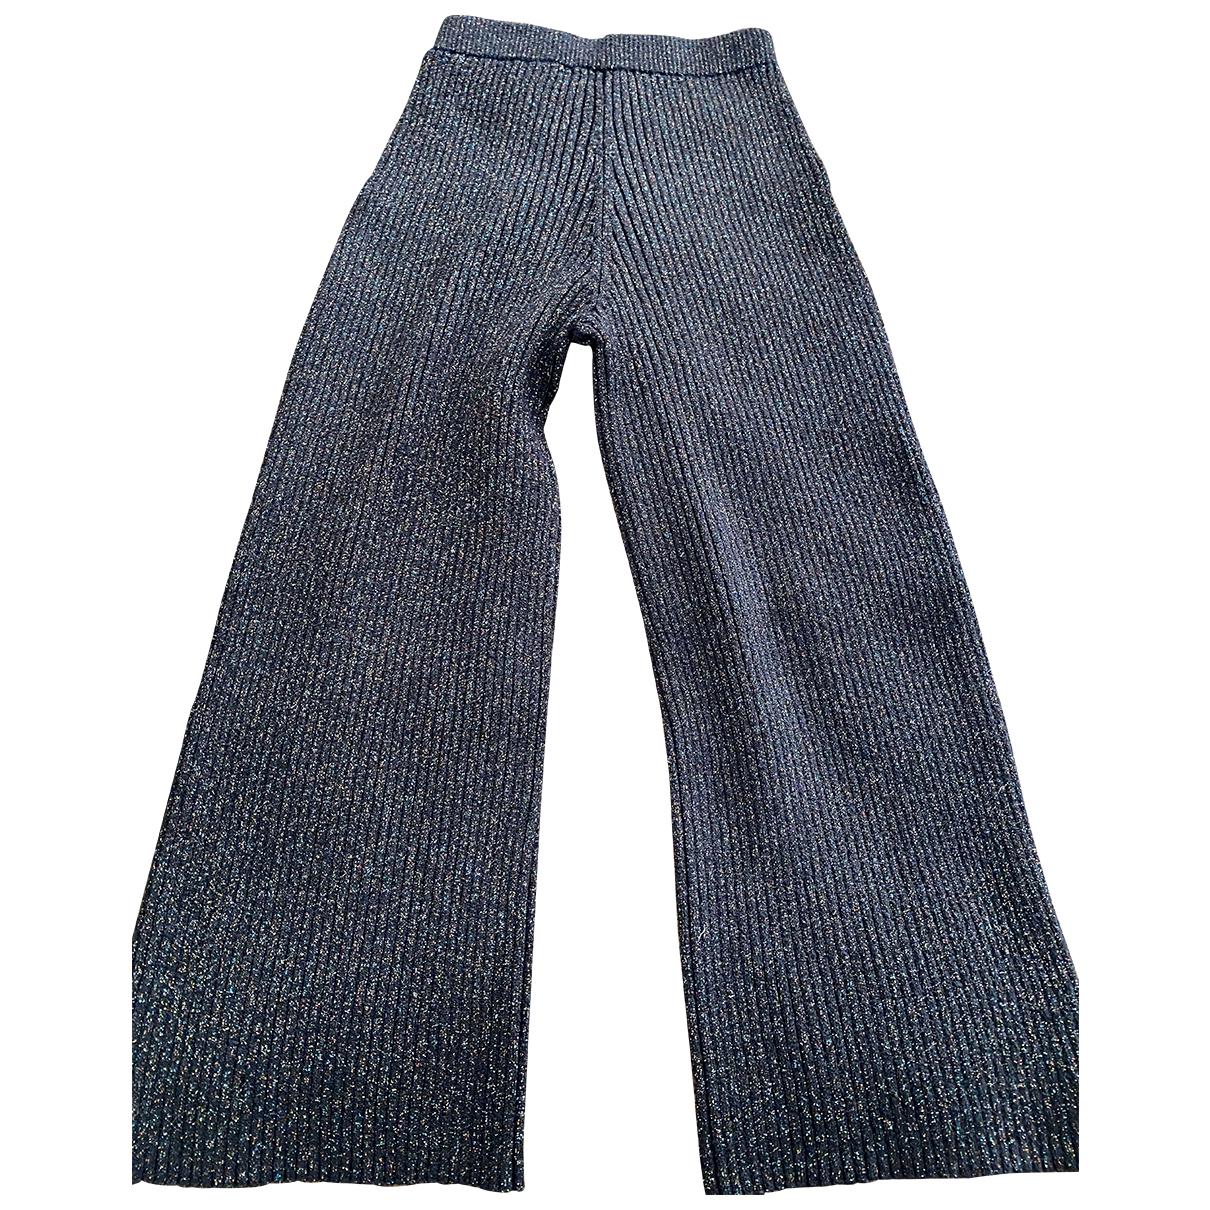 Kenzo \N Metallic Trousers for Women XS International